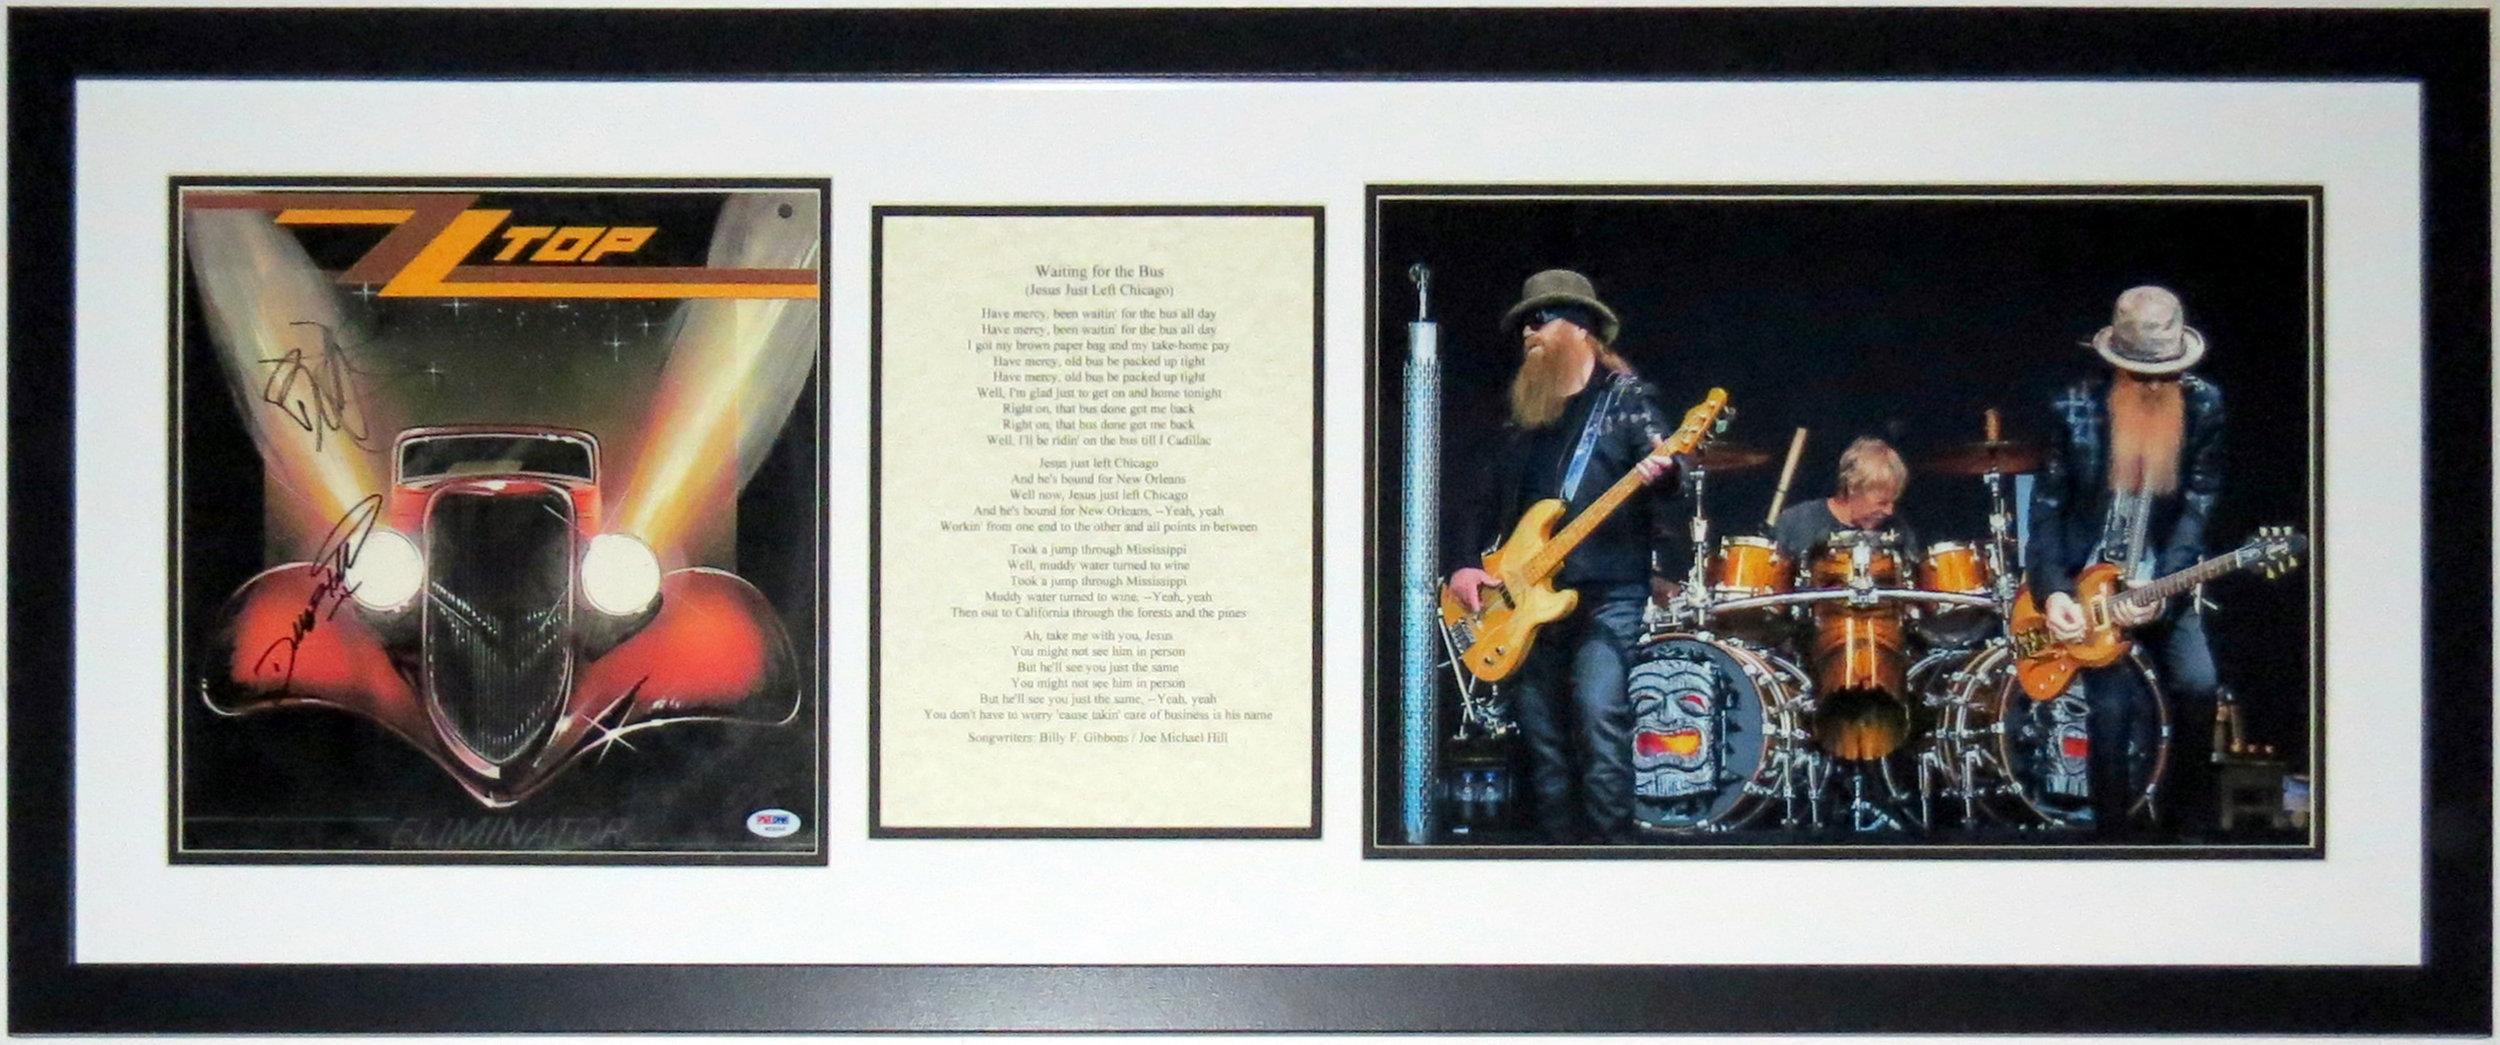 Dusty Hill & Billy Gibbons Dual Signed ZZ Top Eliminator Album - PSA DNA COA Authenticated - Professionally Framed & Lyrics & Concert Photo